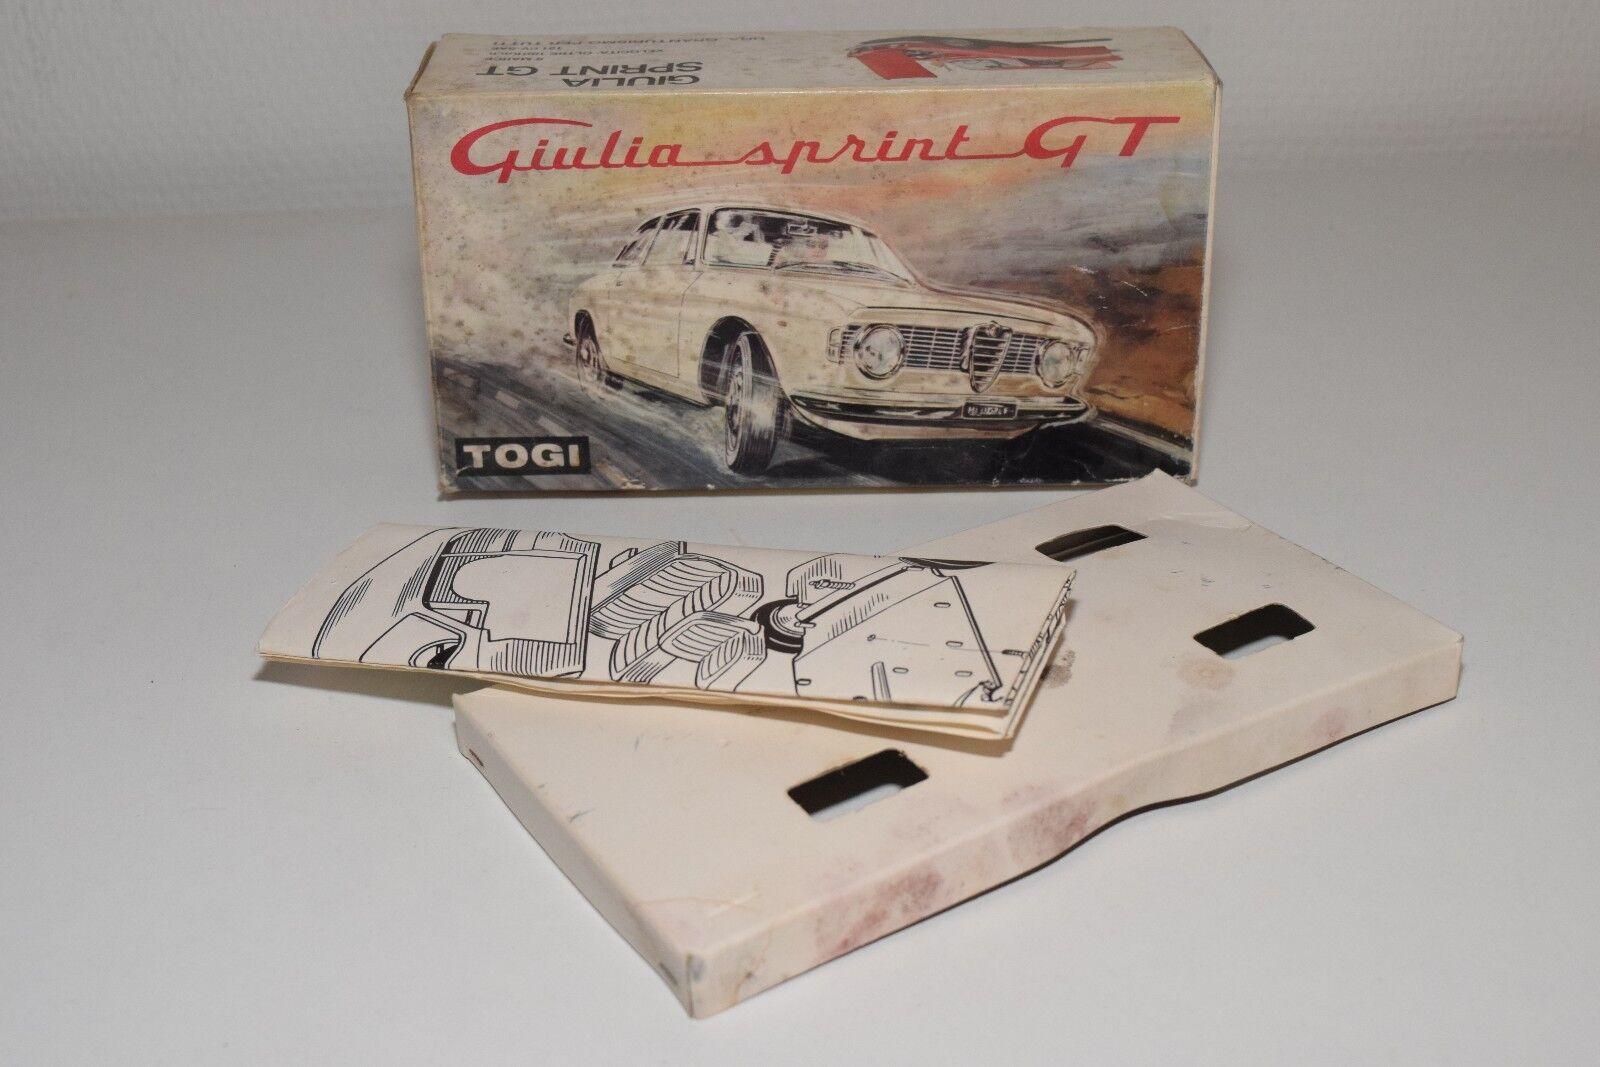 V 1 23 TOGI ALFA ROMEO GIULIA SPRINT GT A GTA EMPTY ORIGINAL BOX EXCELLENT